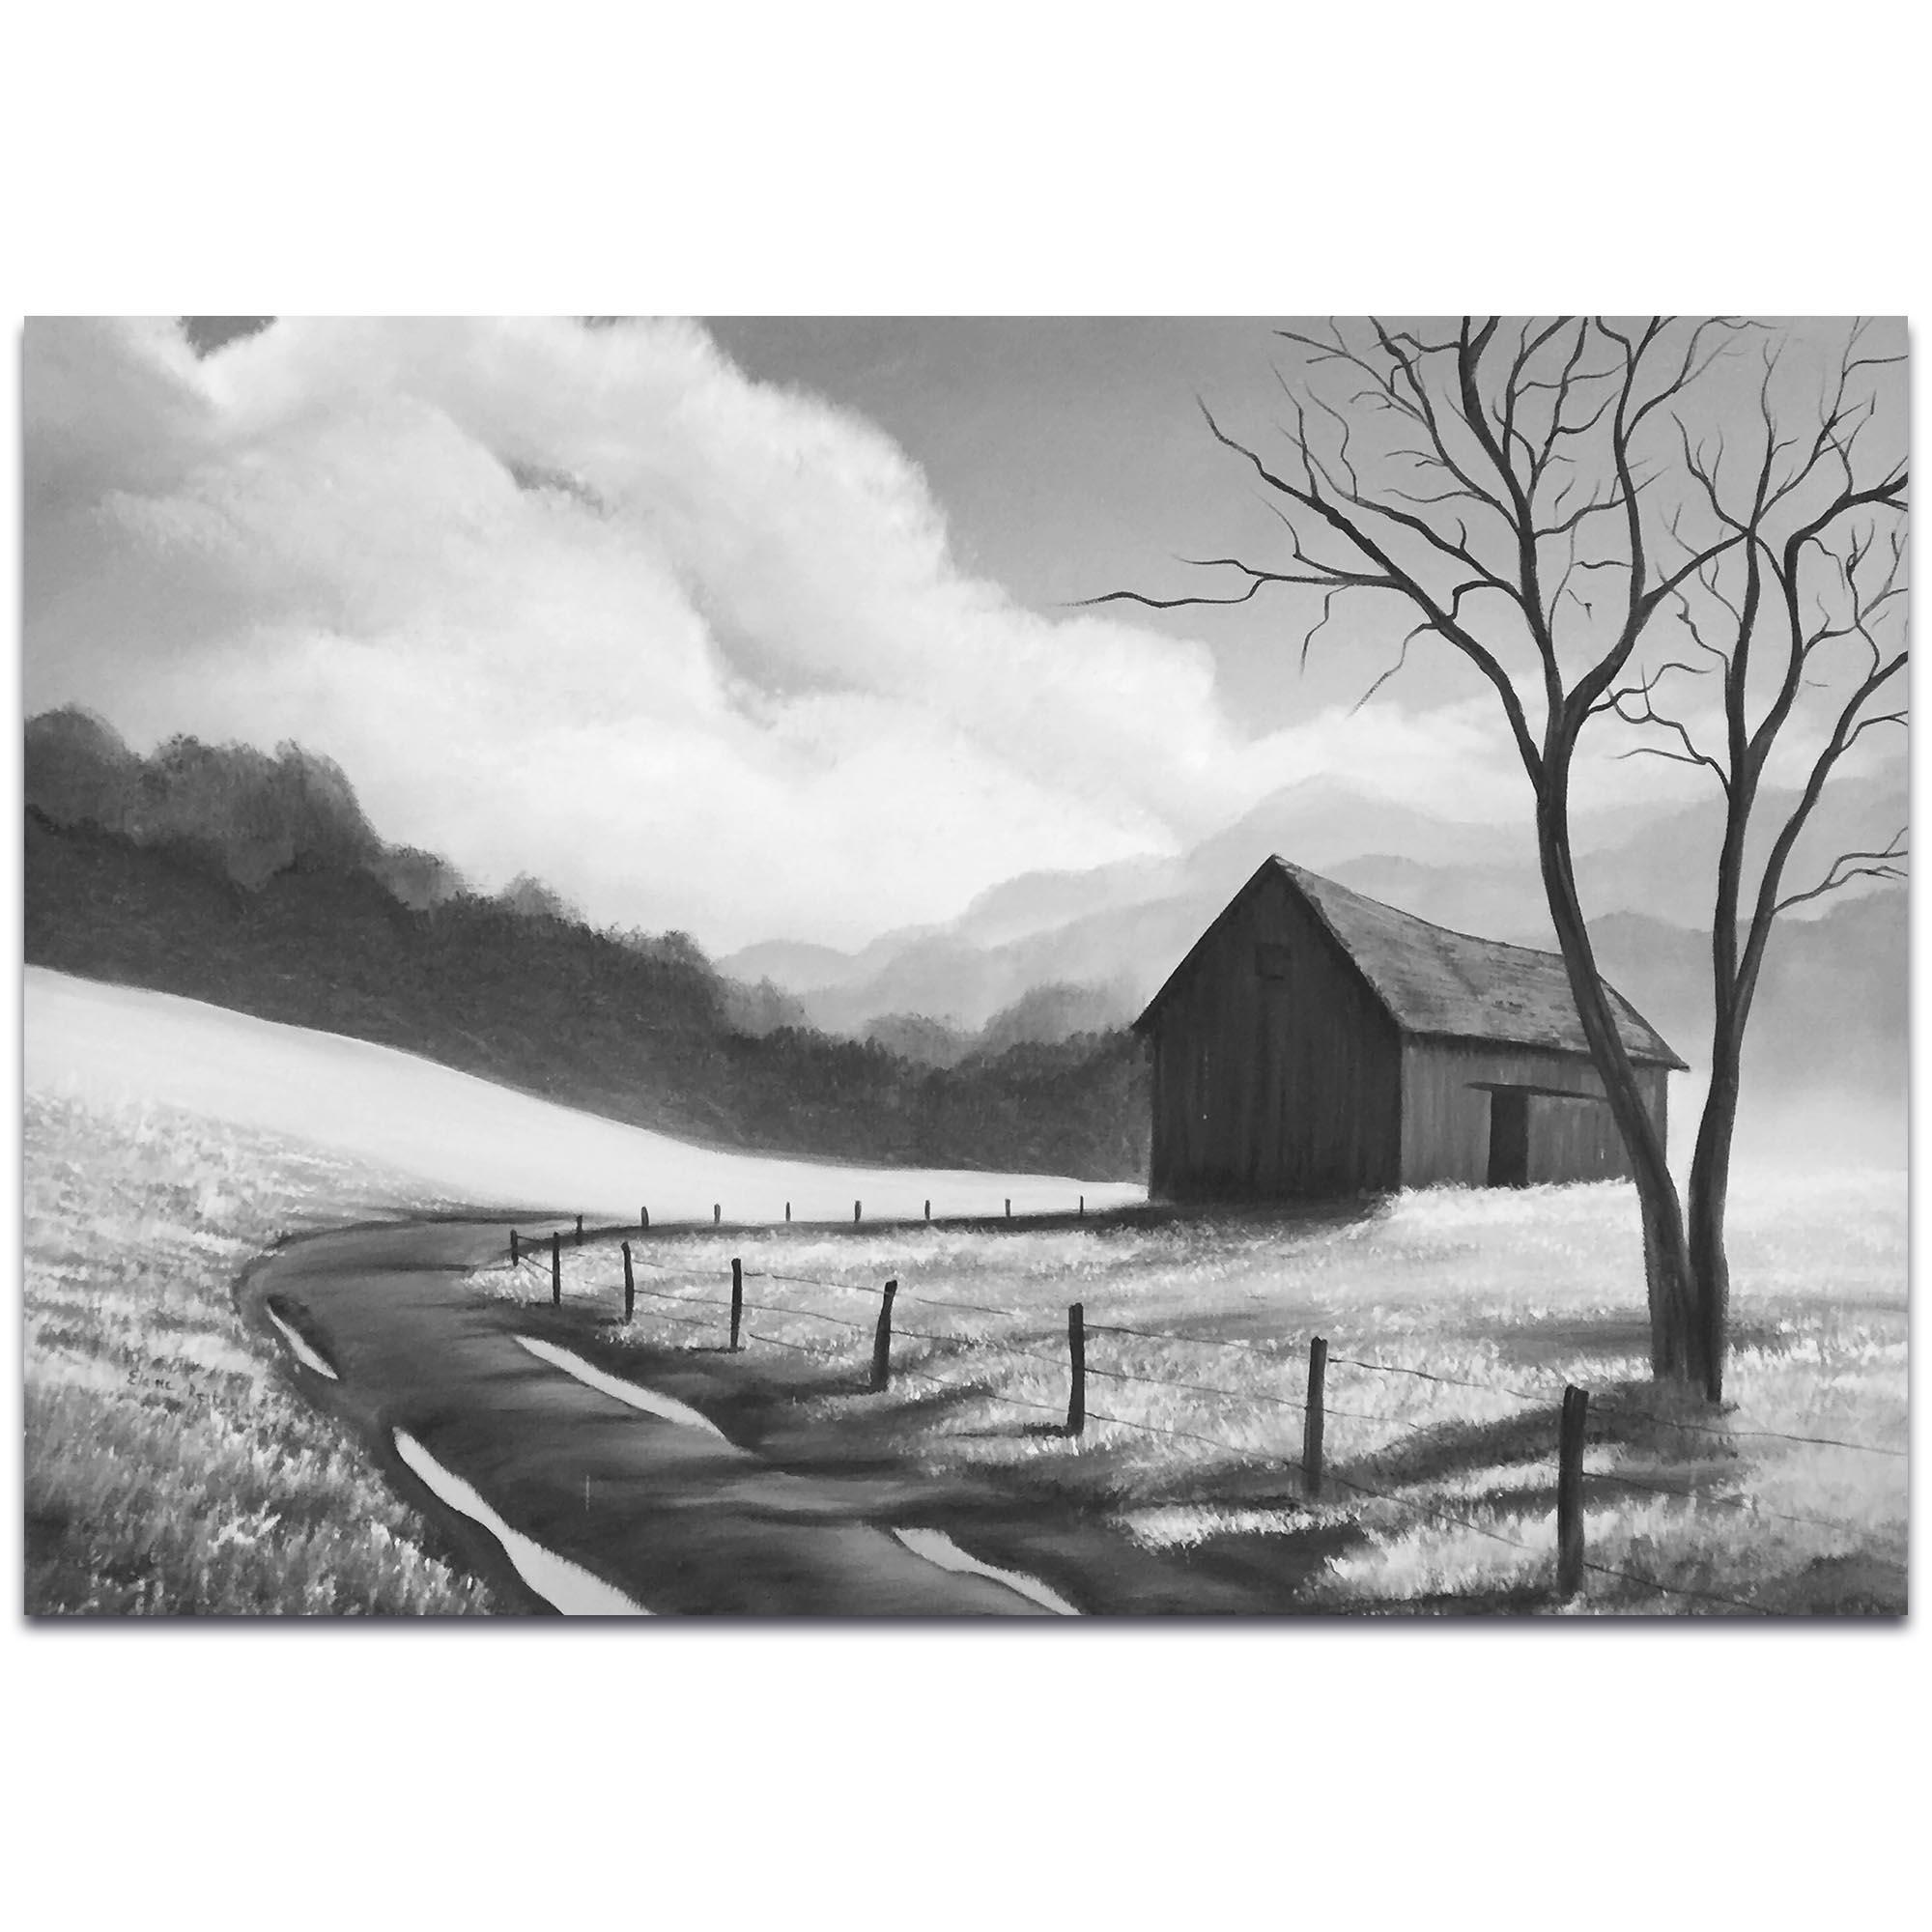 Western Painting 'Prairie Life' - Rustic Decor on Metal or Acrylic